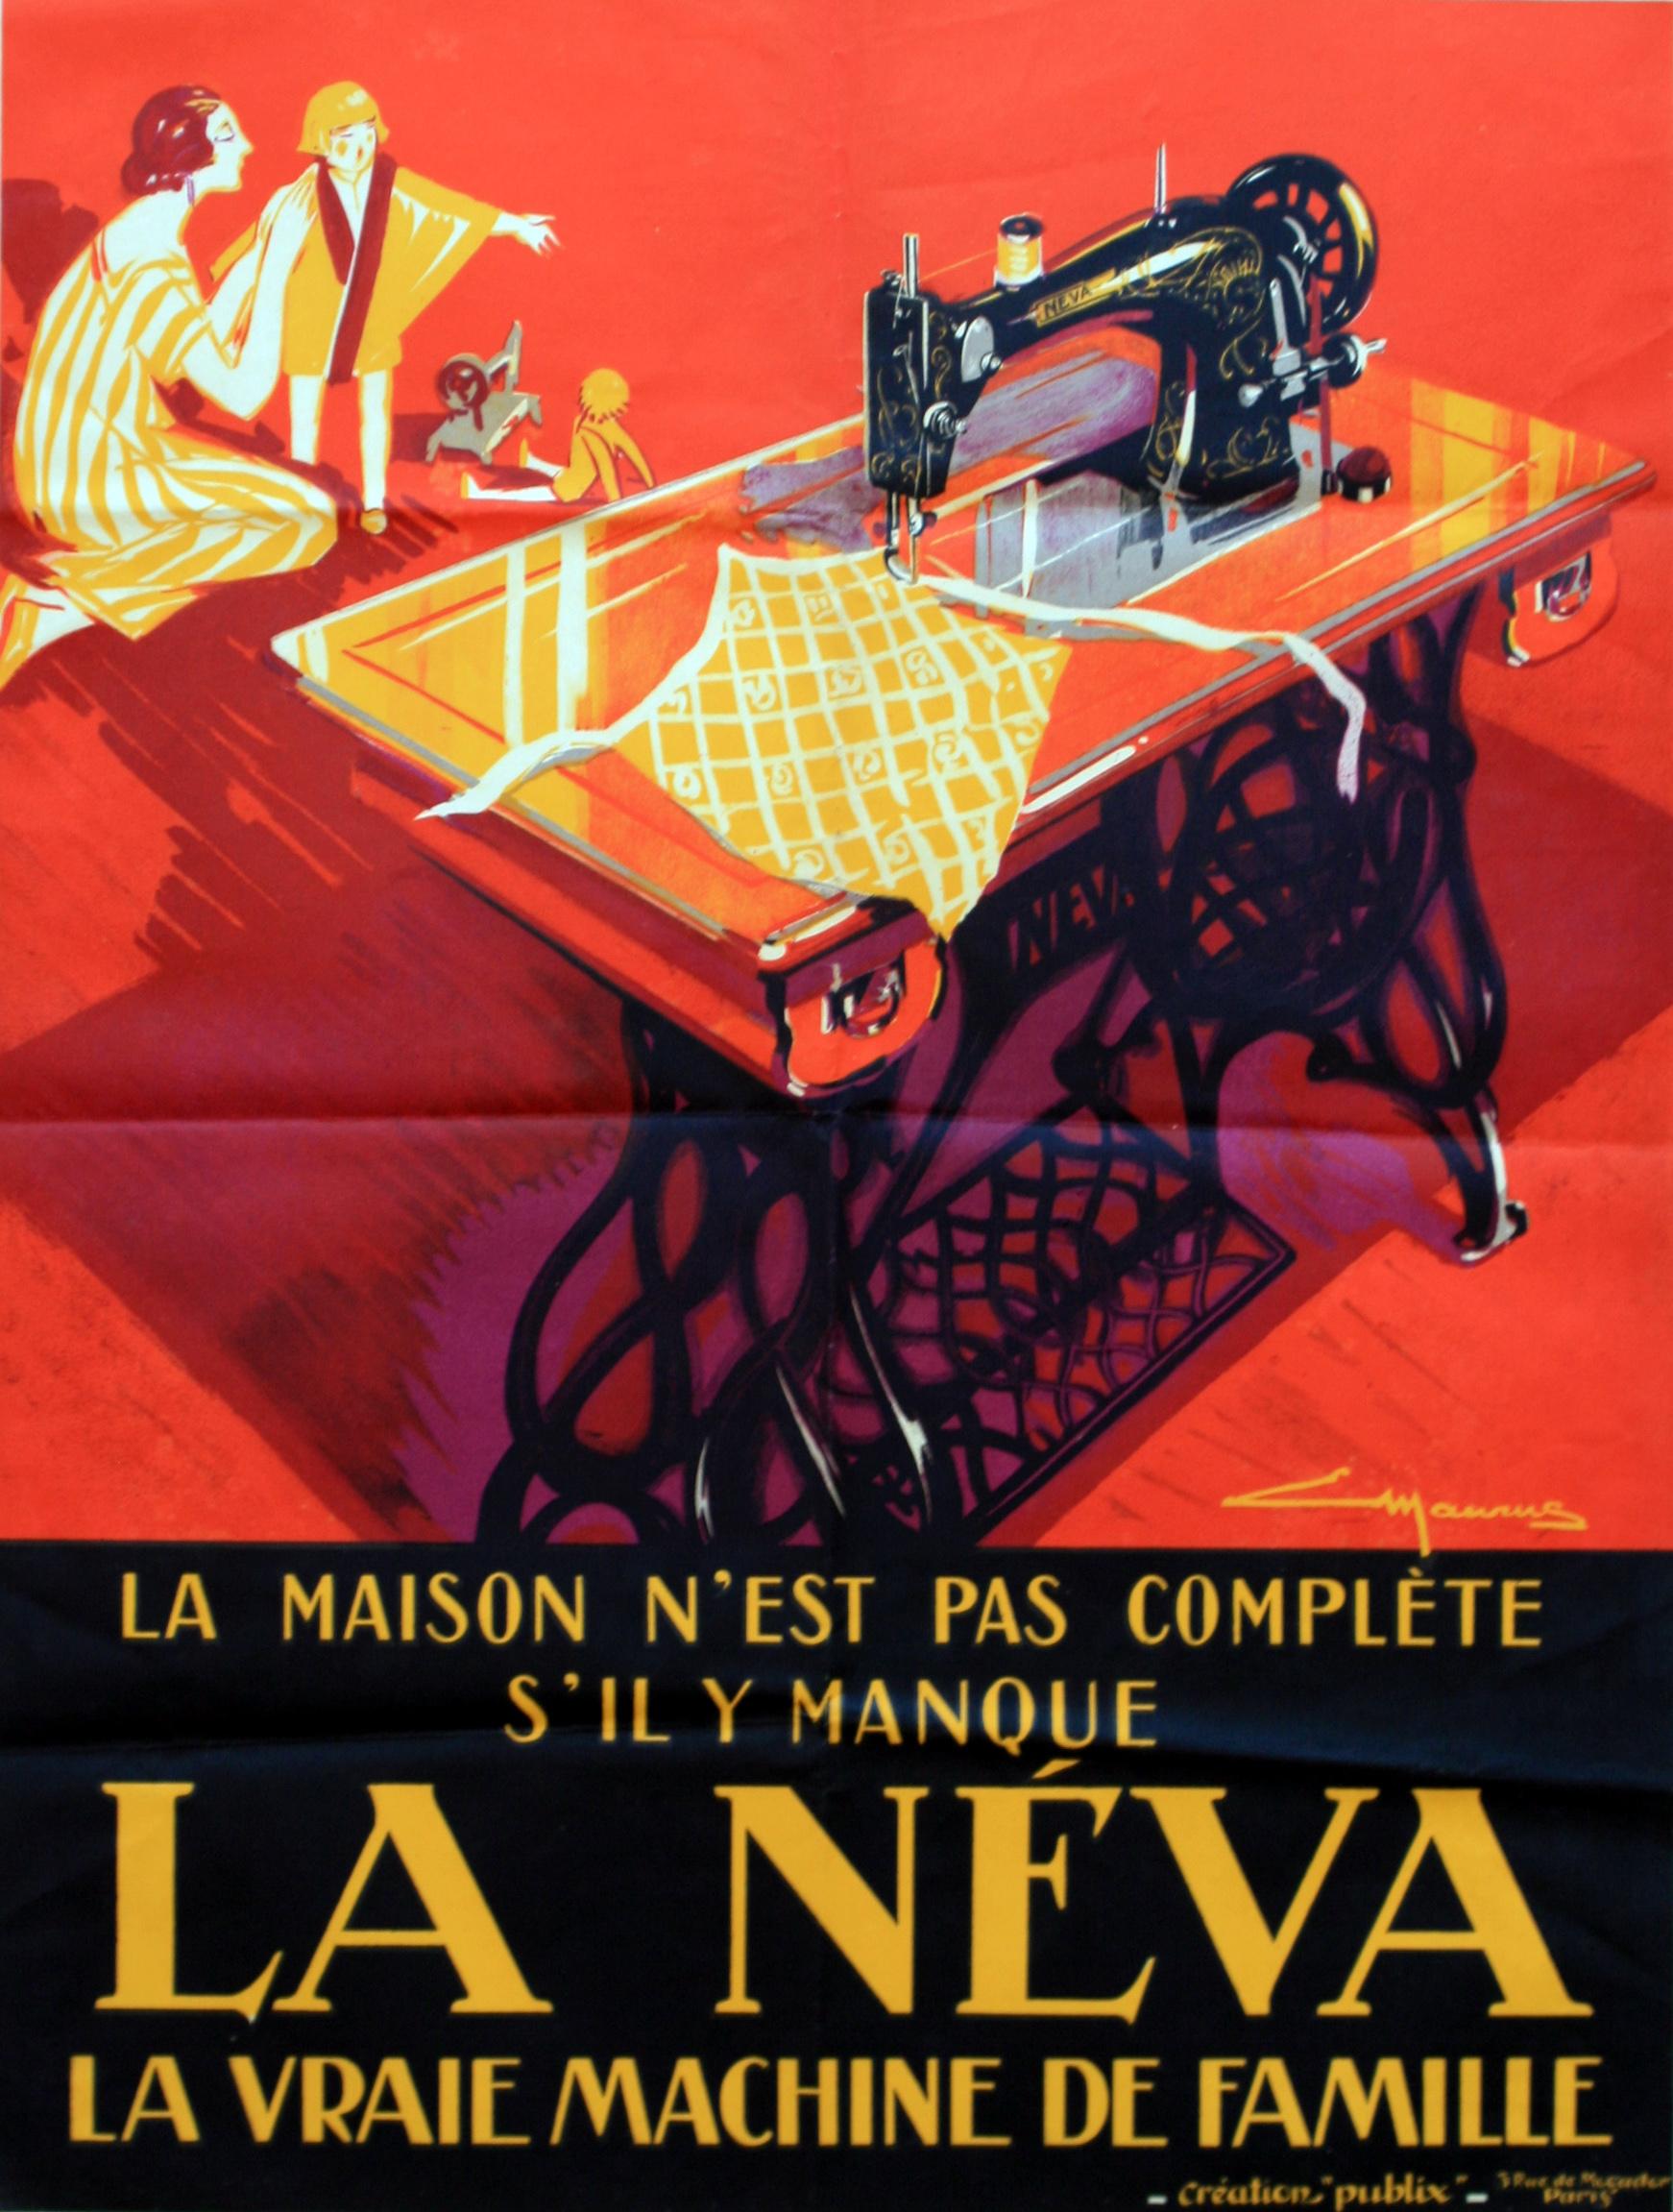 Lot 1200 - Advertising Poster La Neva